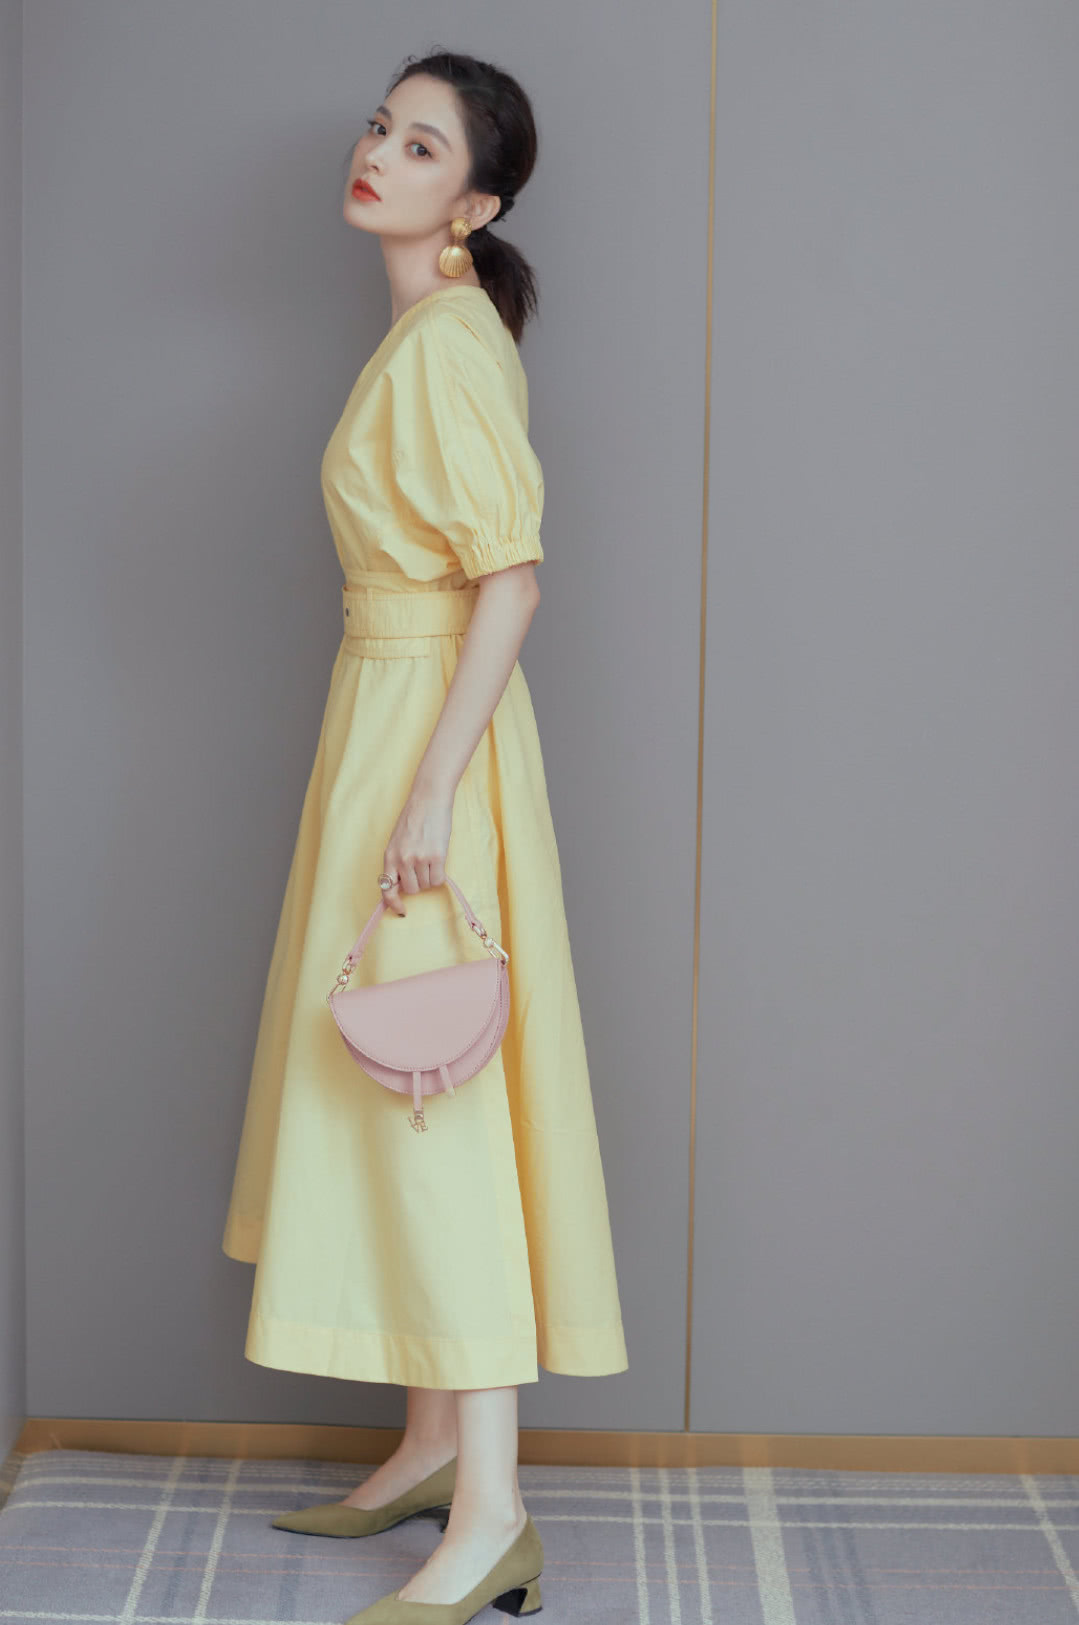 <b>娜扎一袭黄裙美到犯规,但看到她的指甲颜色后,直男:被门夹了?</b>